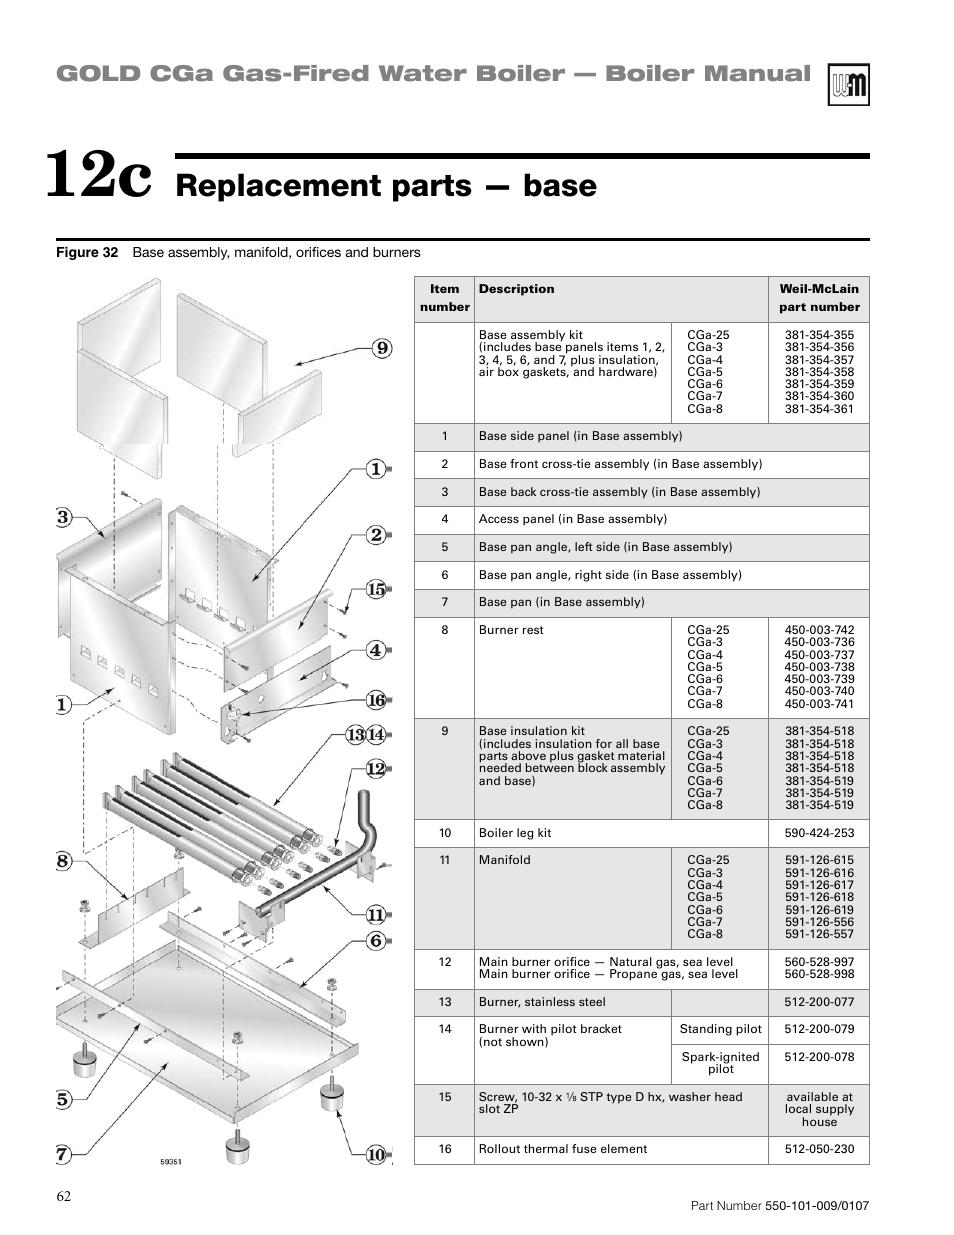 Funky Weil Mclain Cga Photos - Electrical Diagram Ideas - itseo.info